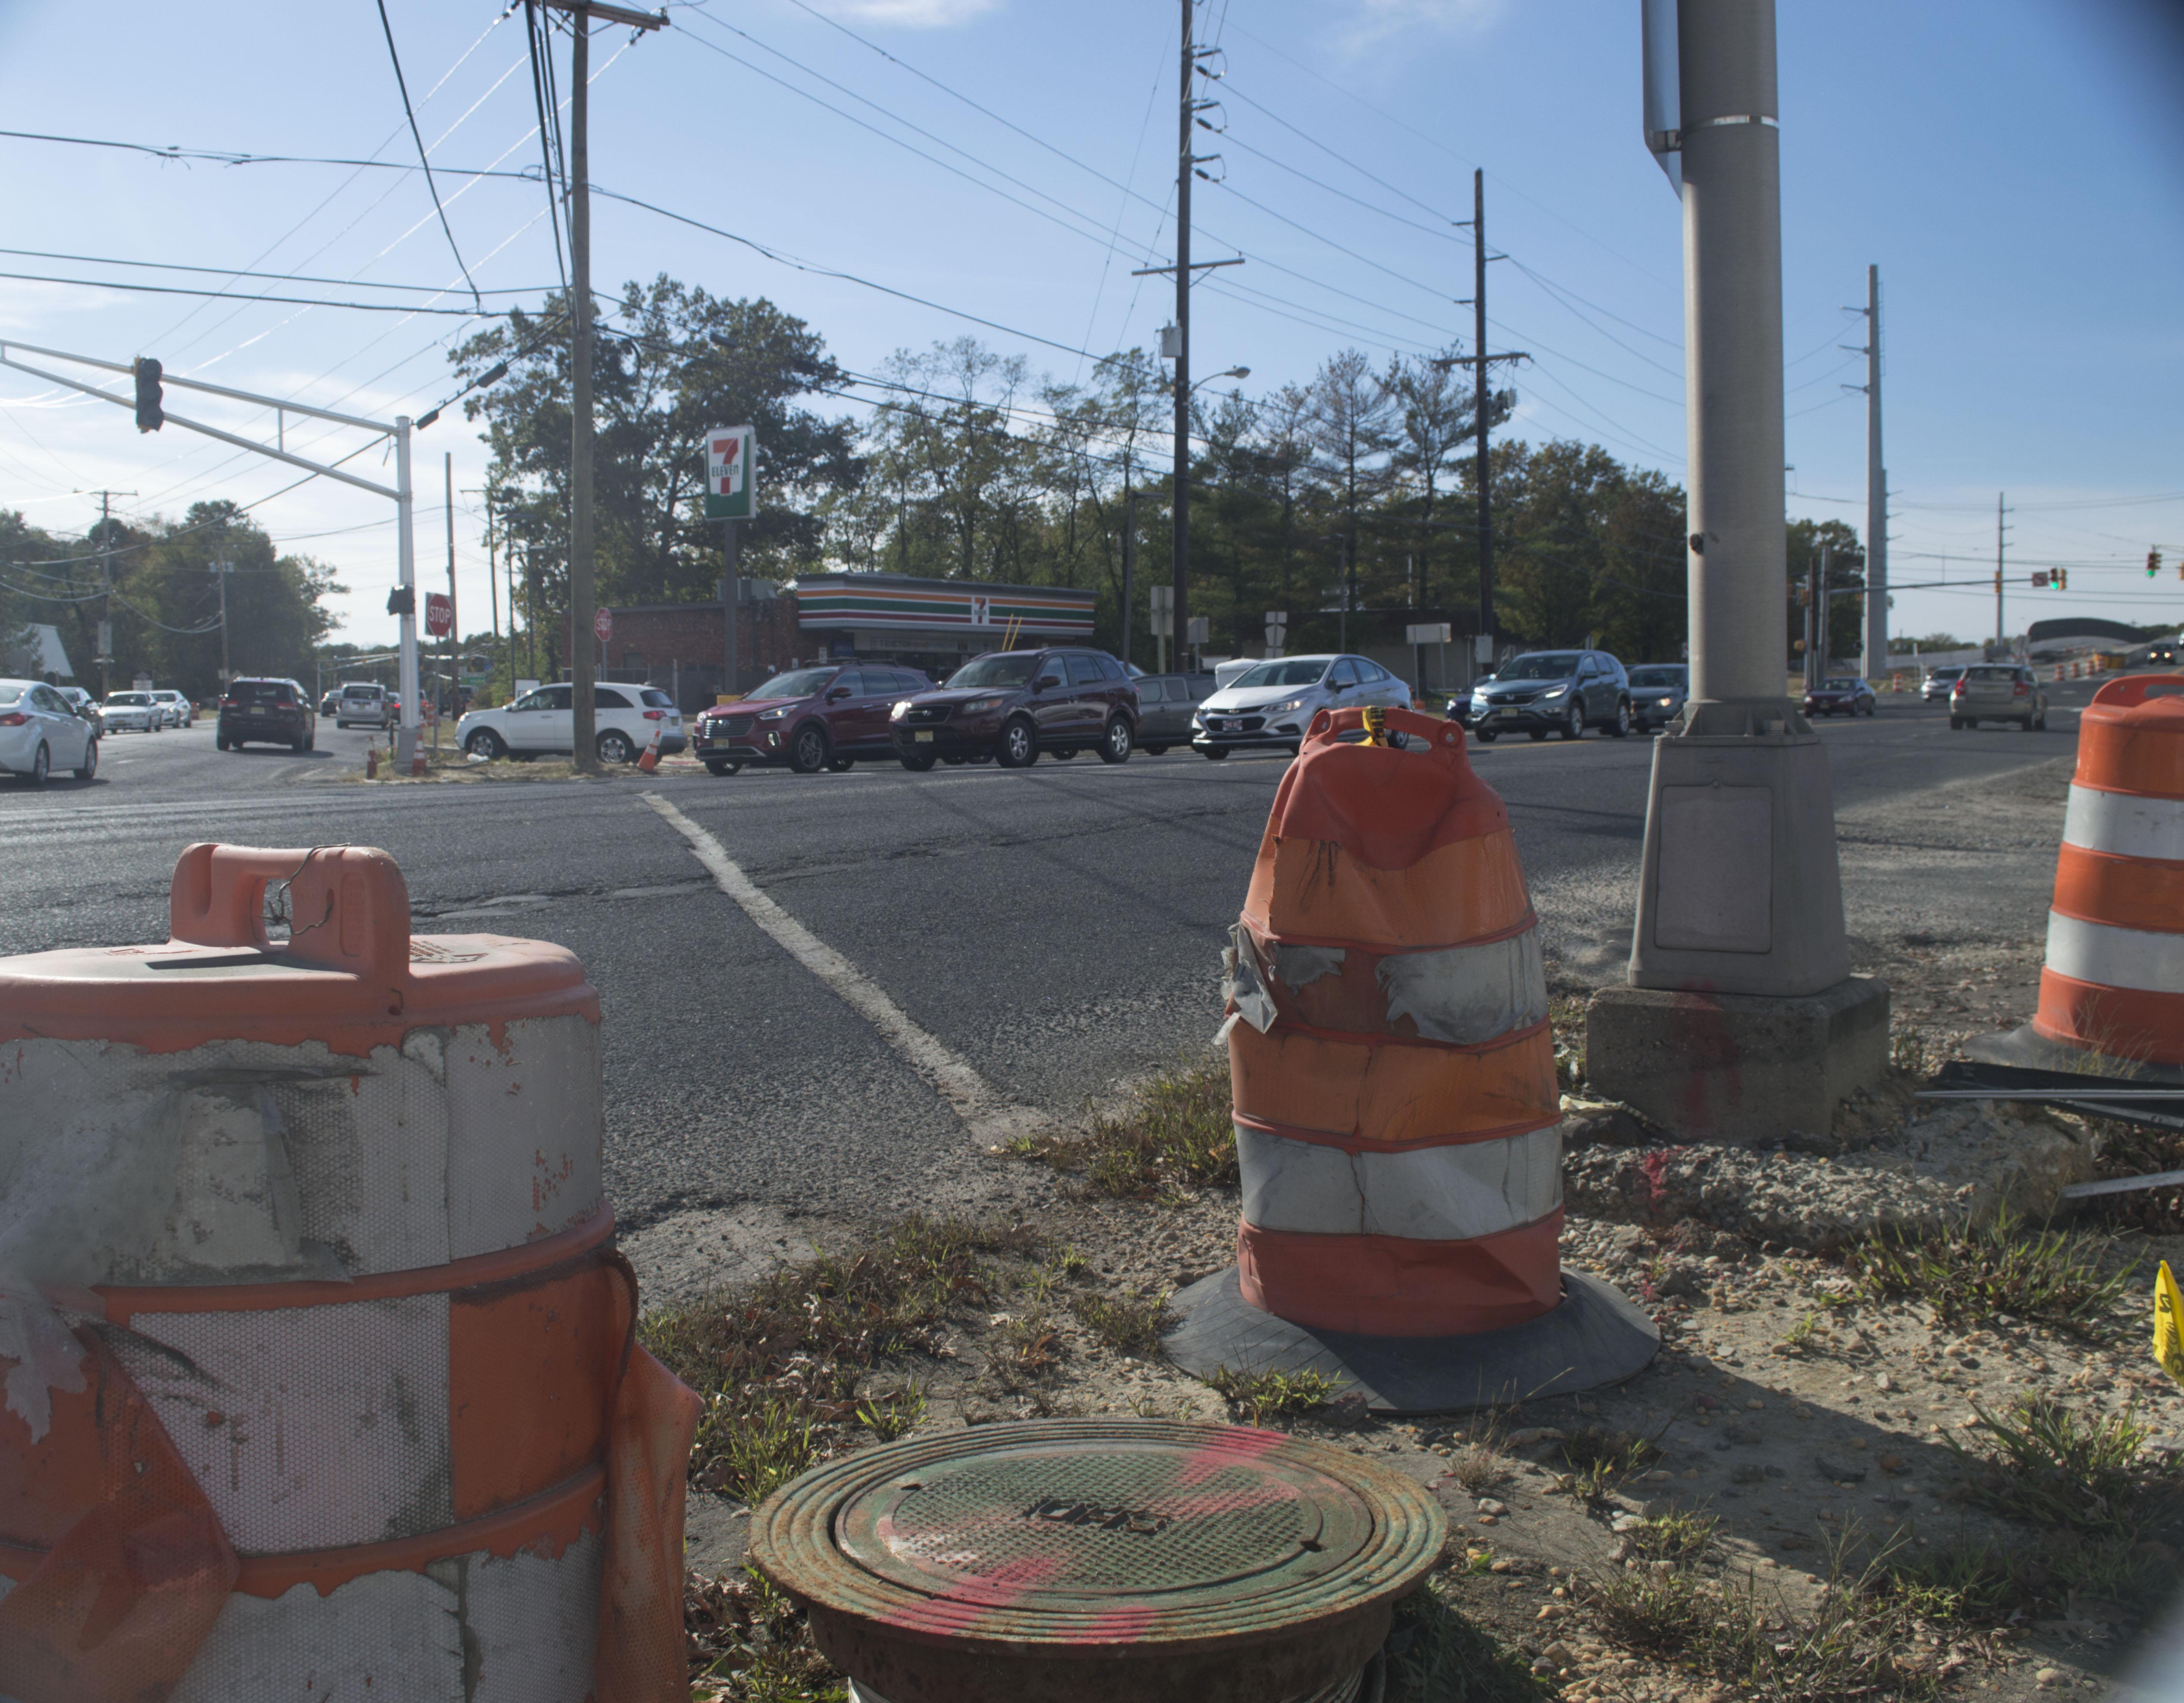 Construction at interchange 91 of the Garden State Parkway in Brick, Oct. 26, 2016. (Photo: Daniel Nee)